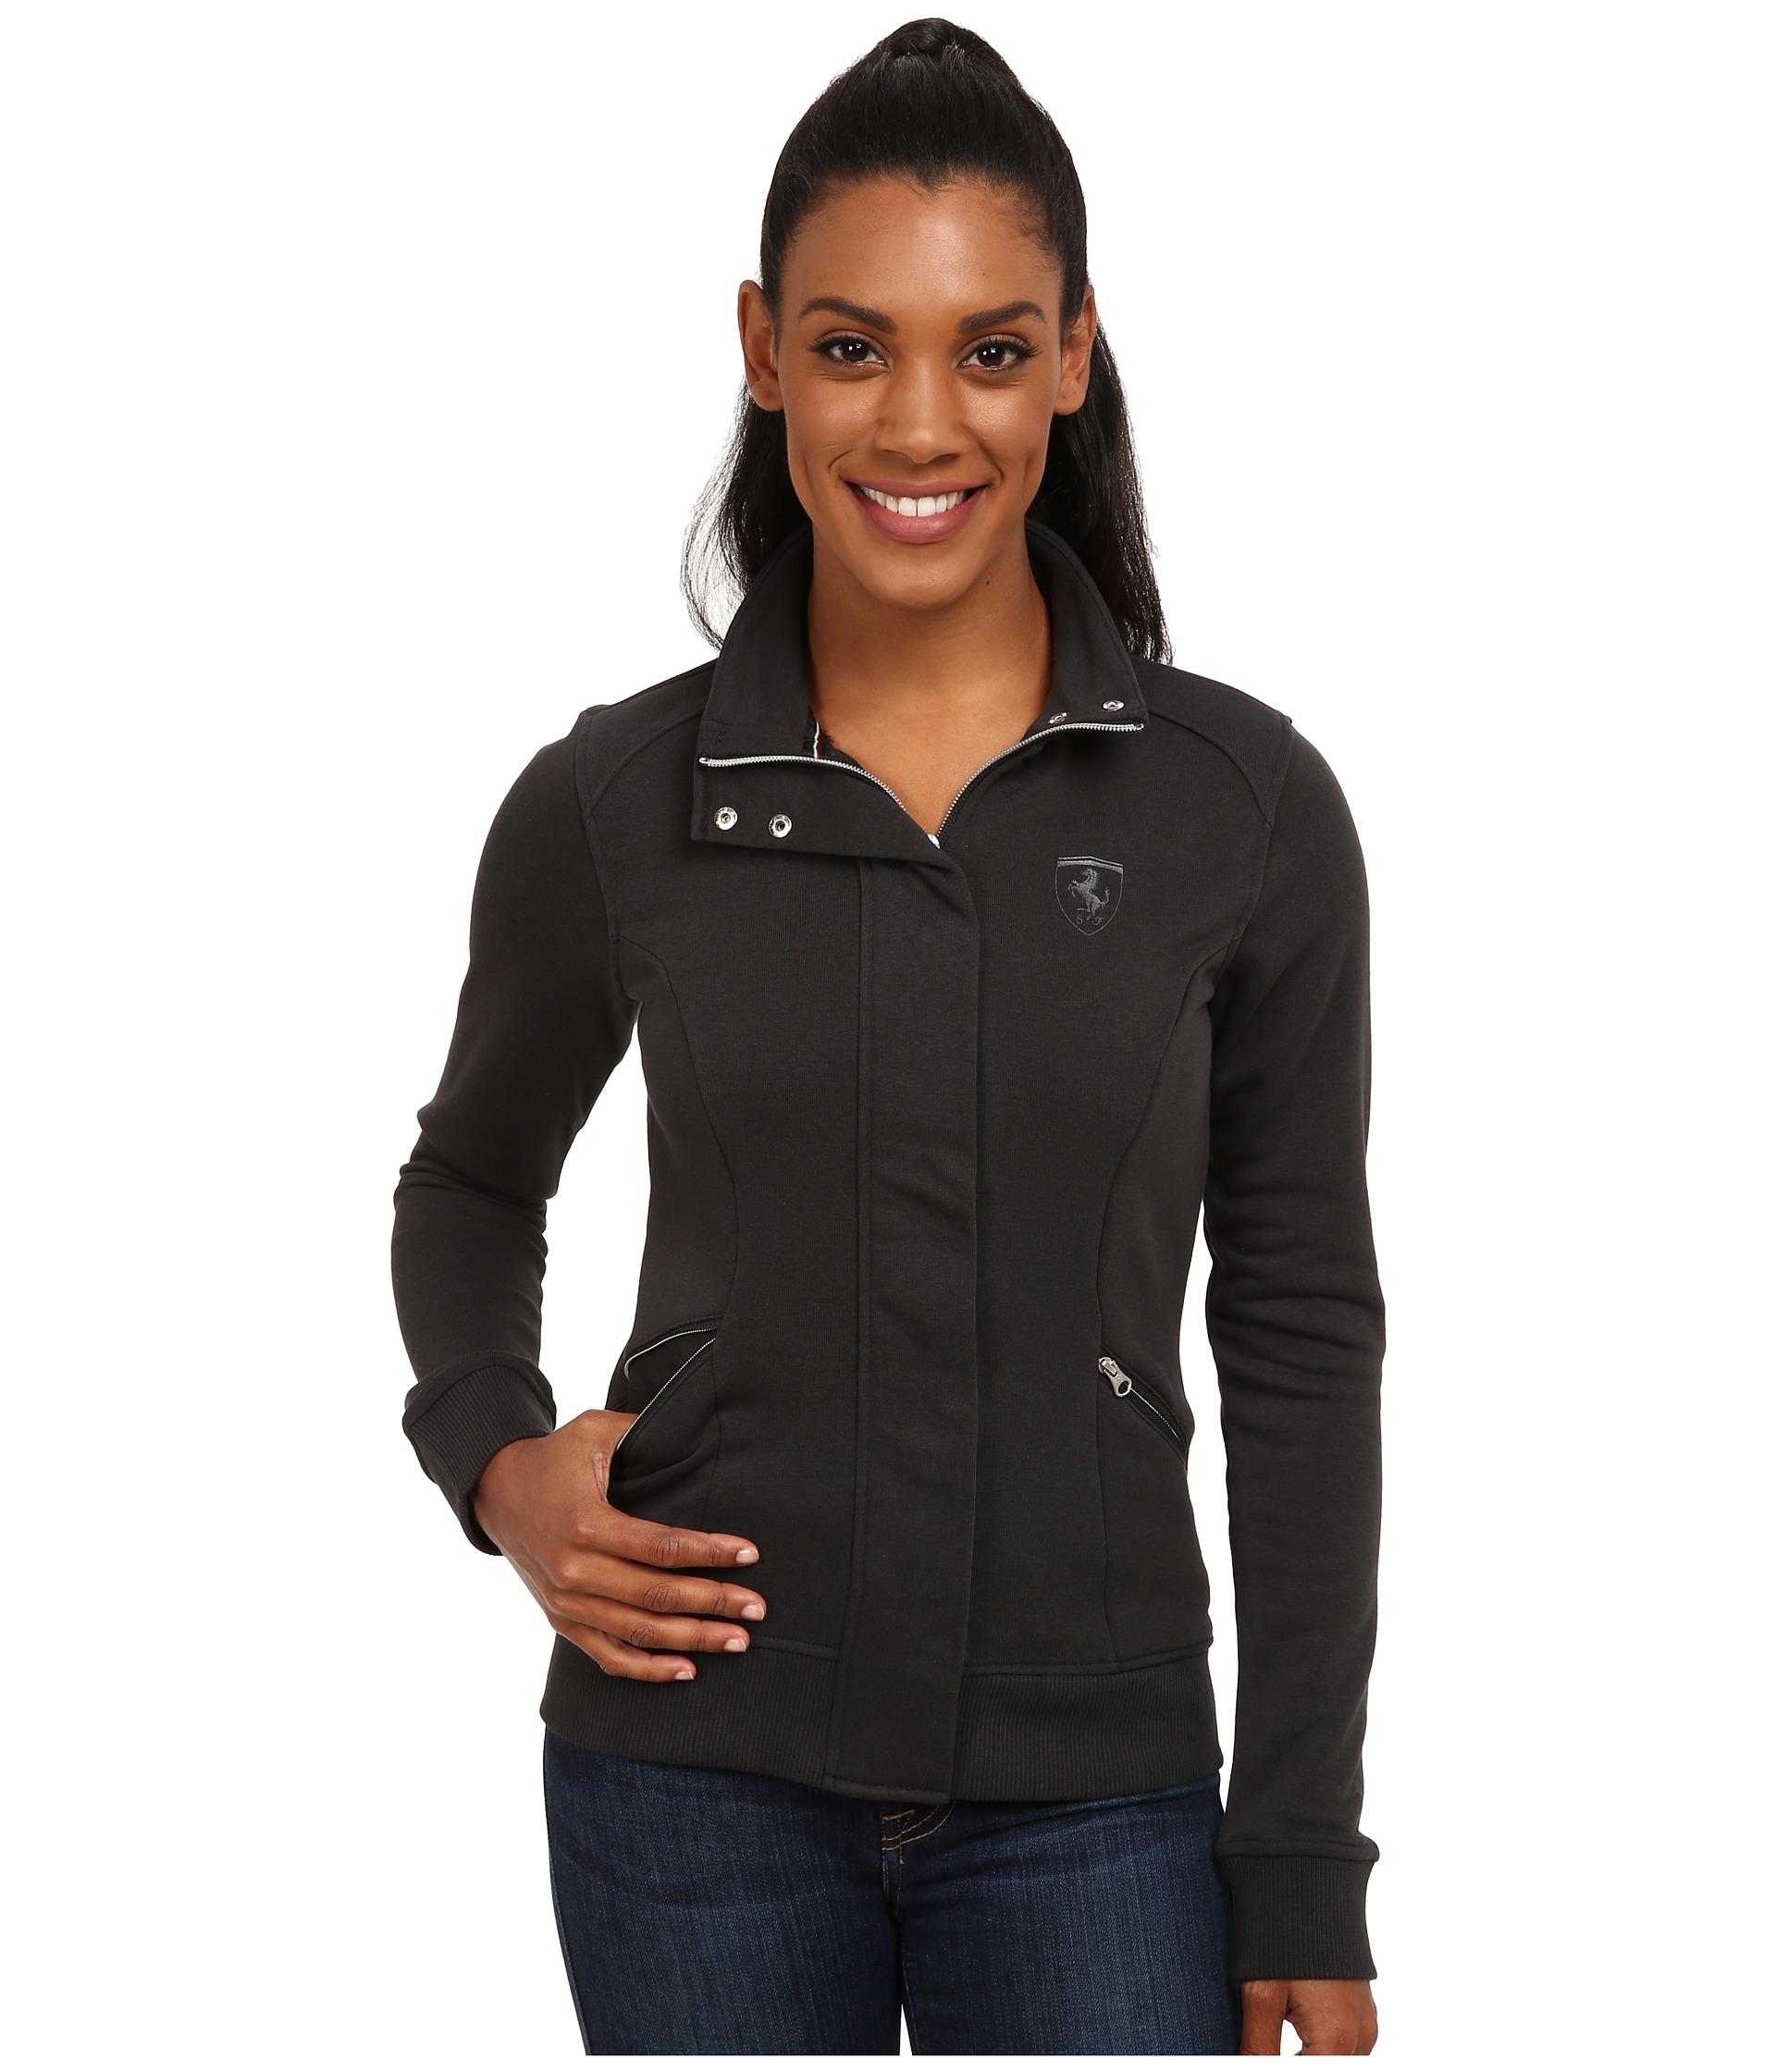 puma ferrari sweat jacket in black lyst. Black Bedroom Furniture Sets. Home Design Ideas